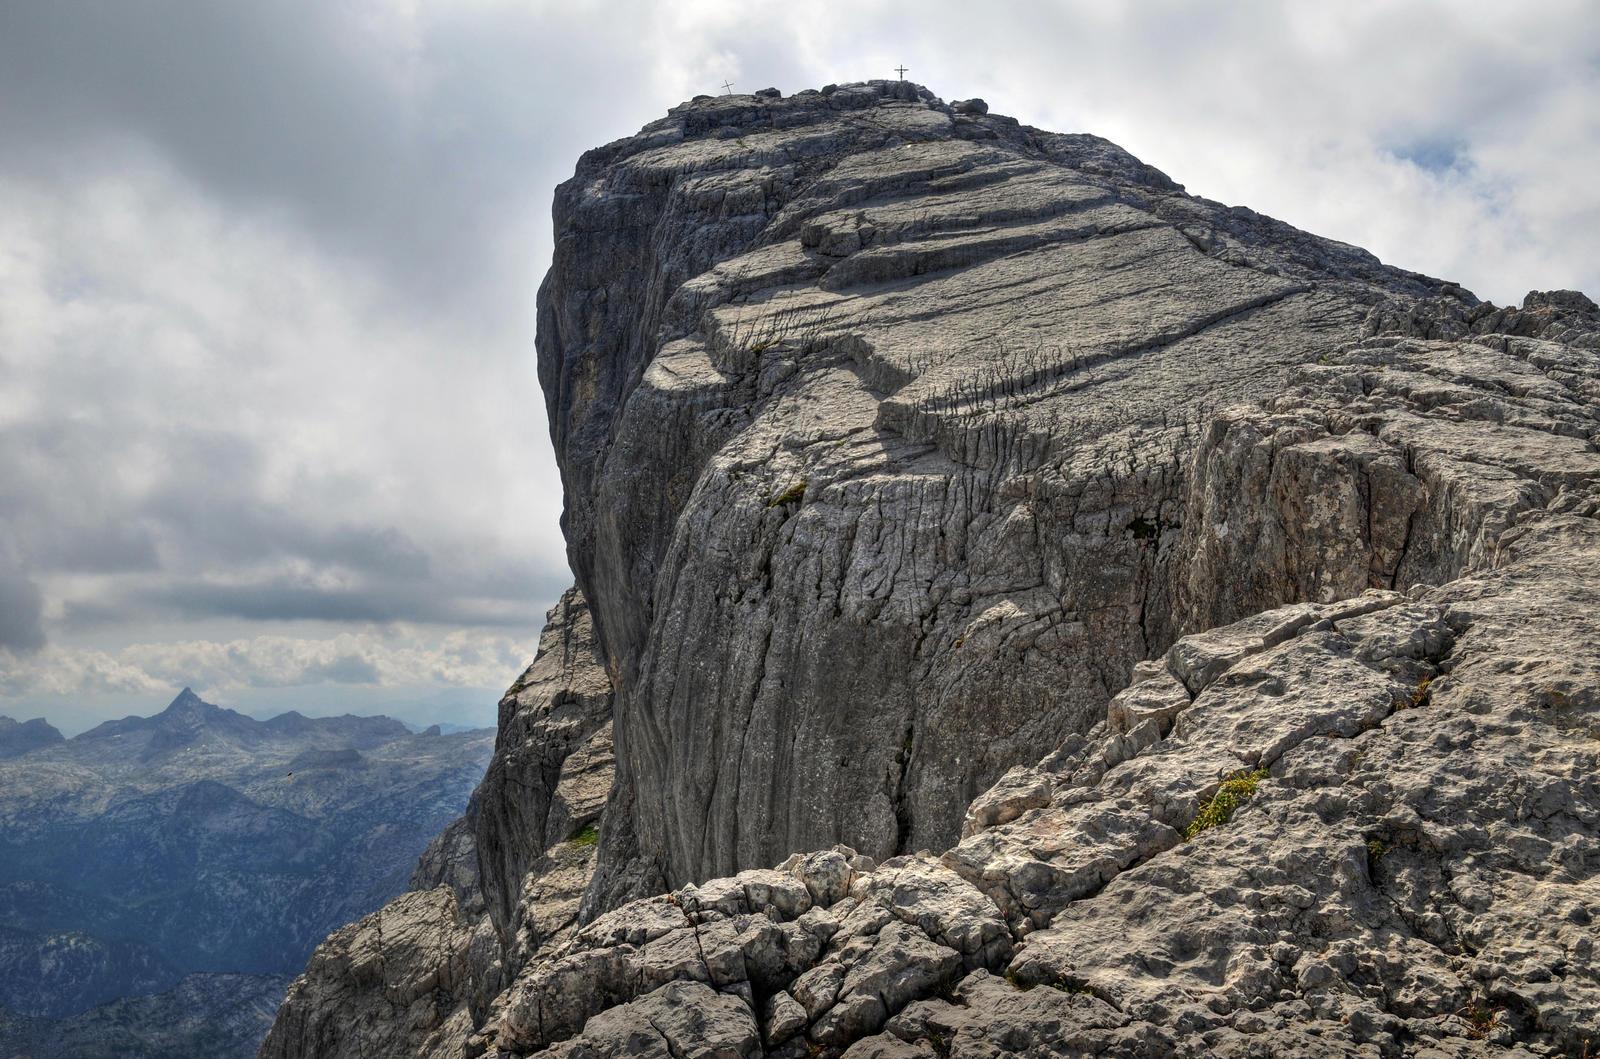 Big Rock by Burtn on DeviantArt